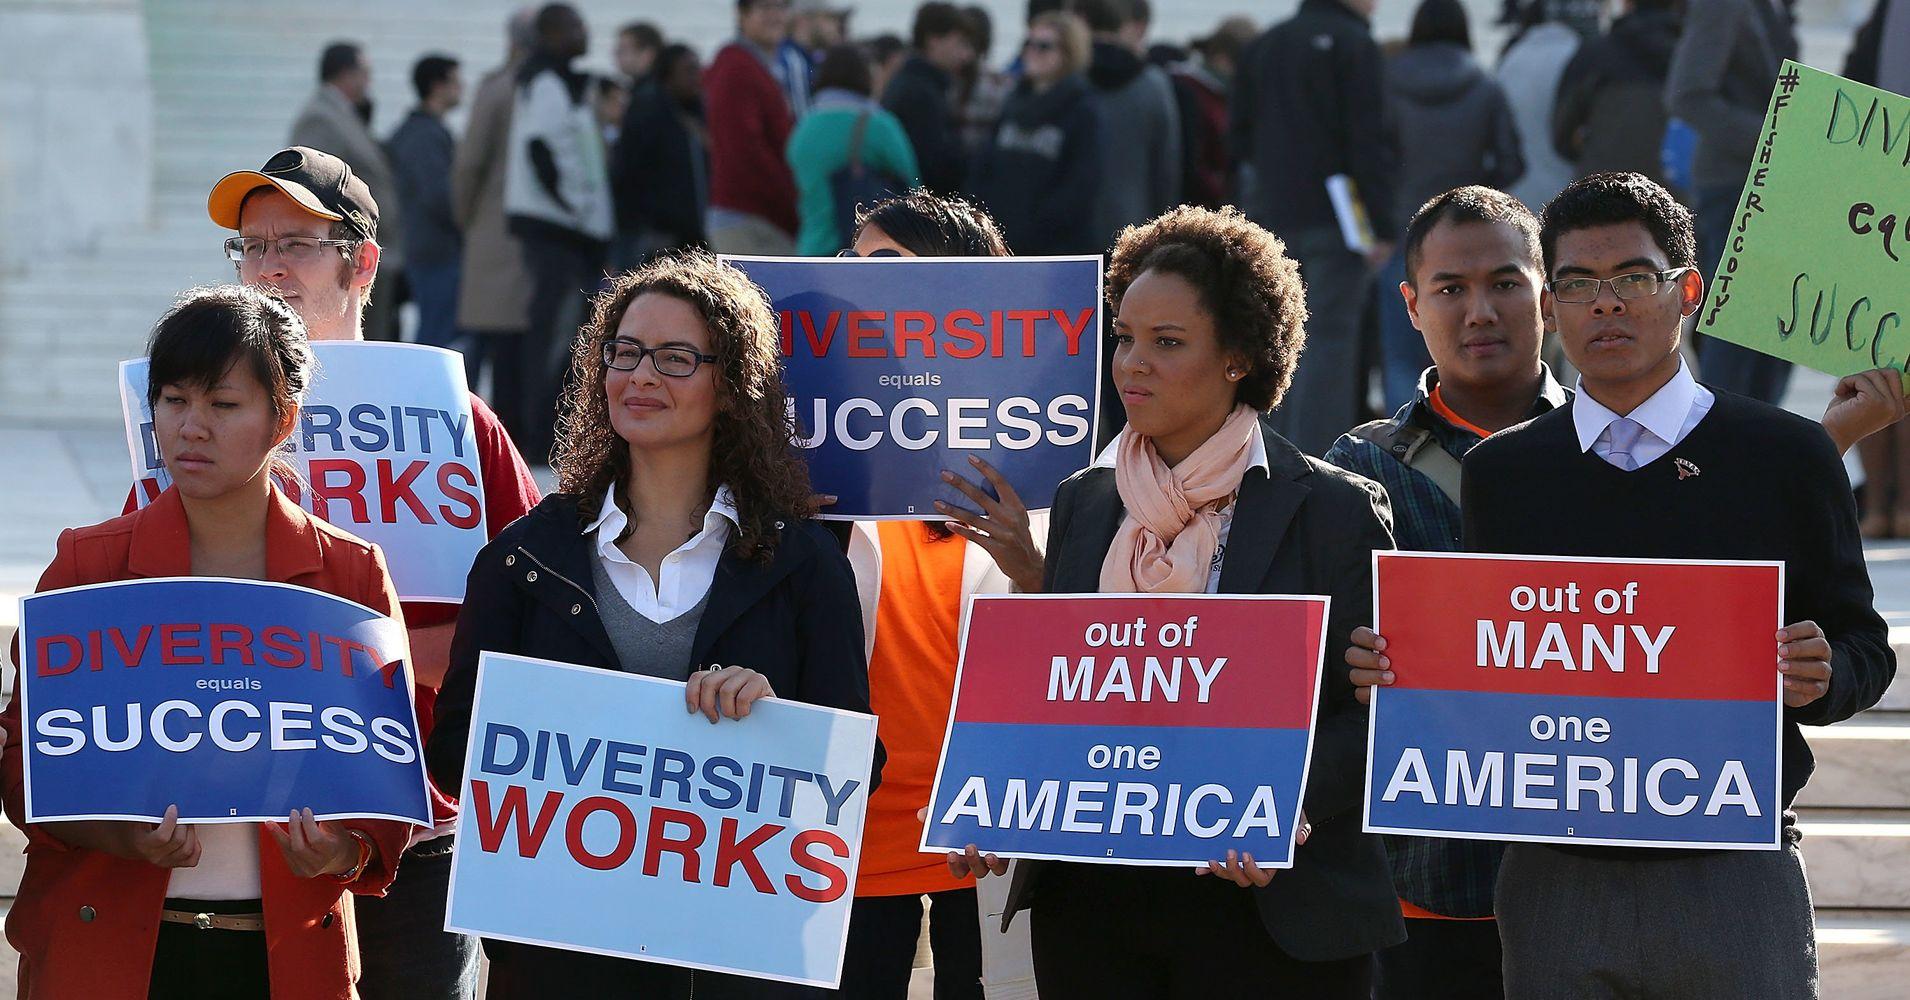 Affirmative Action hurts Minorities